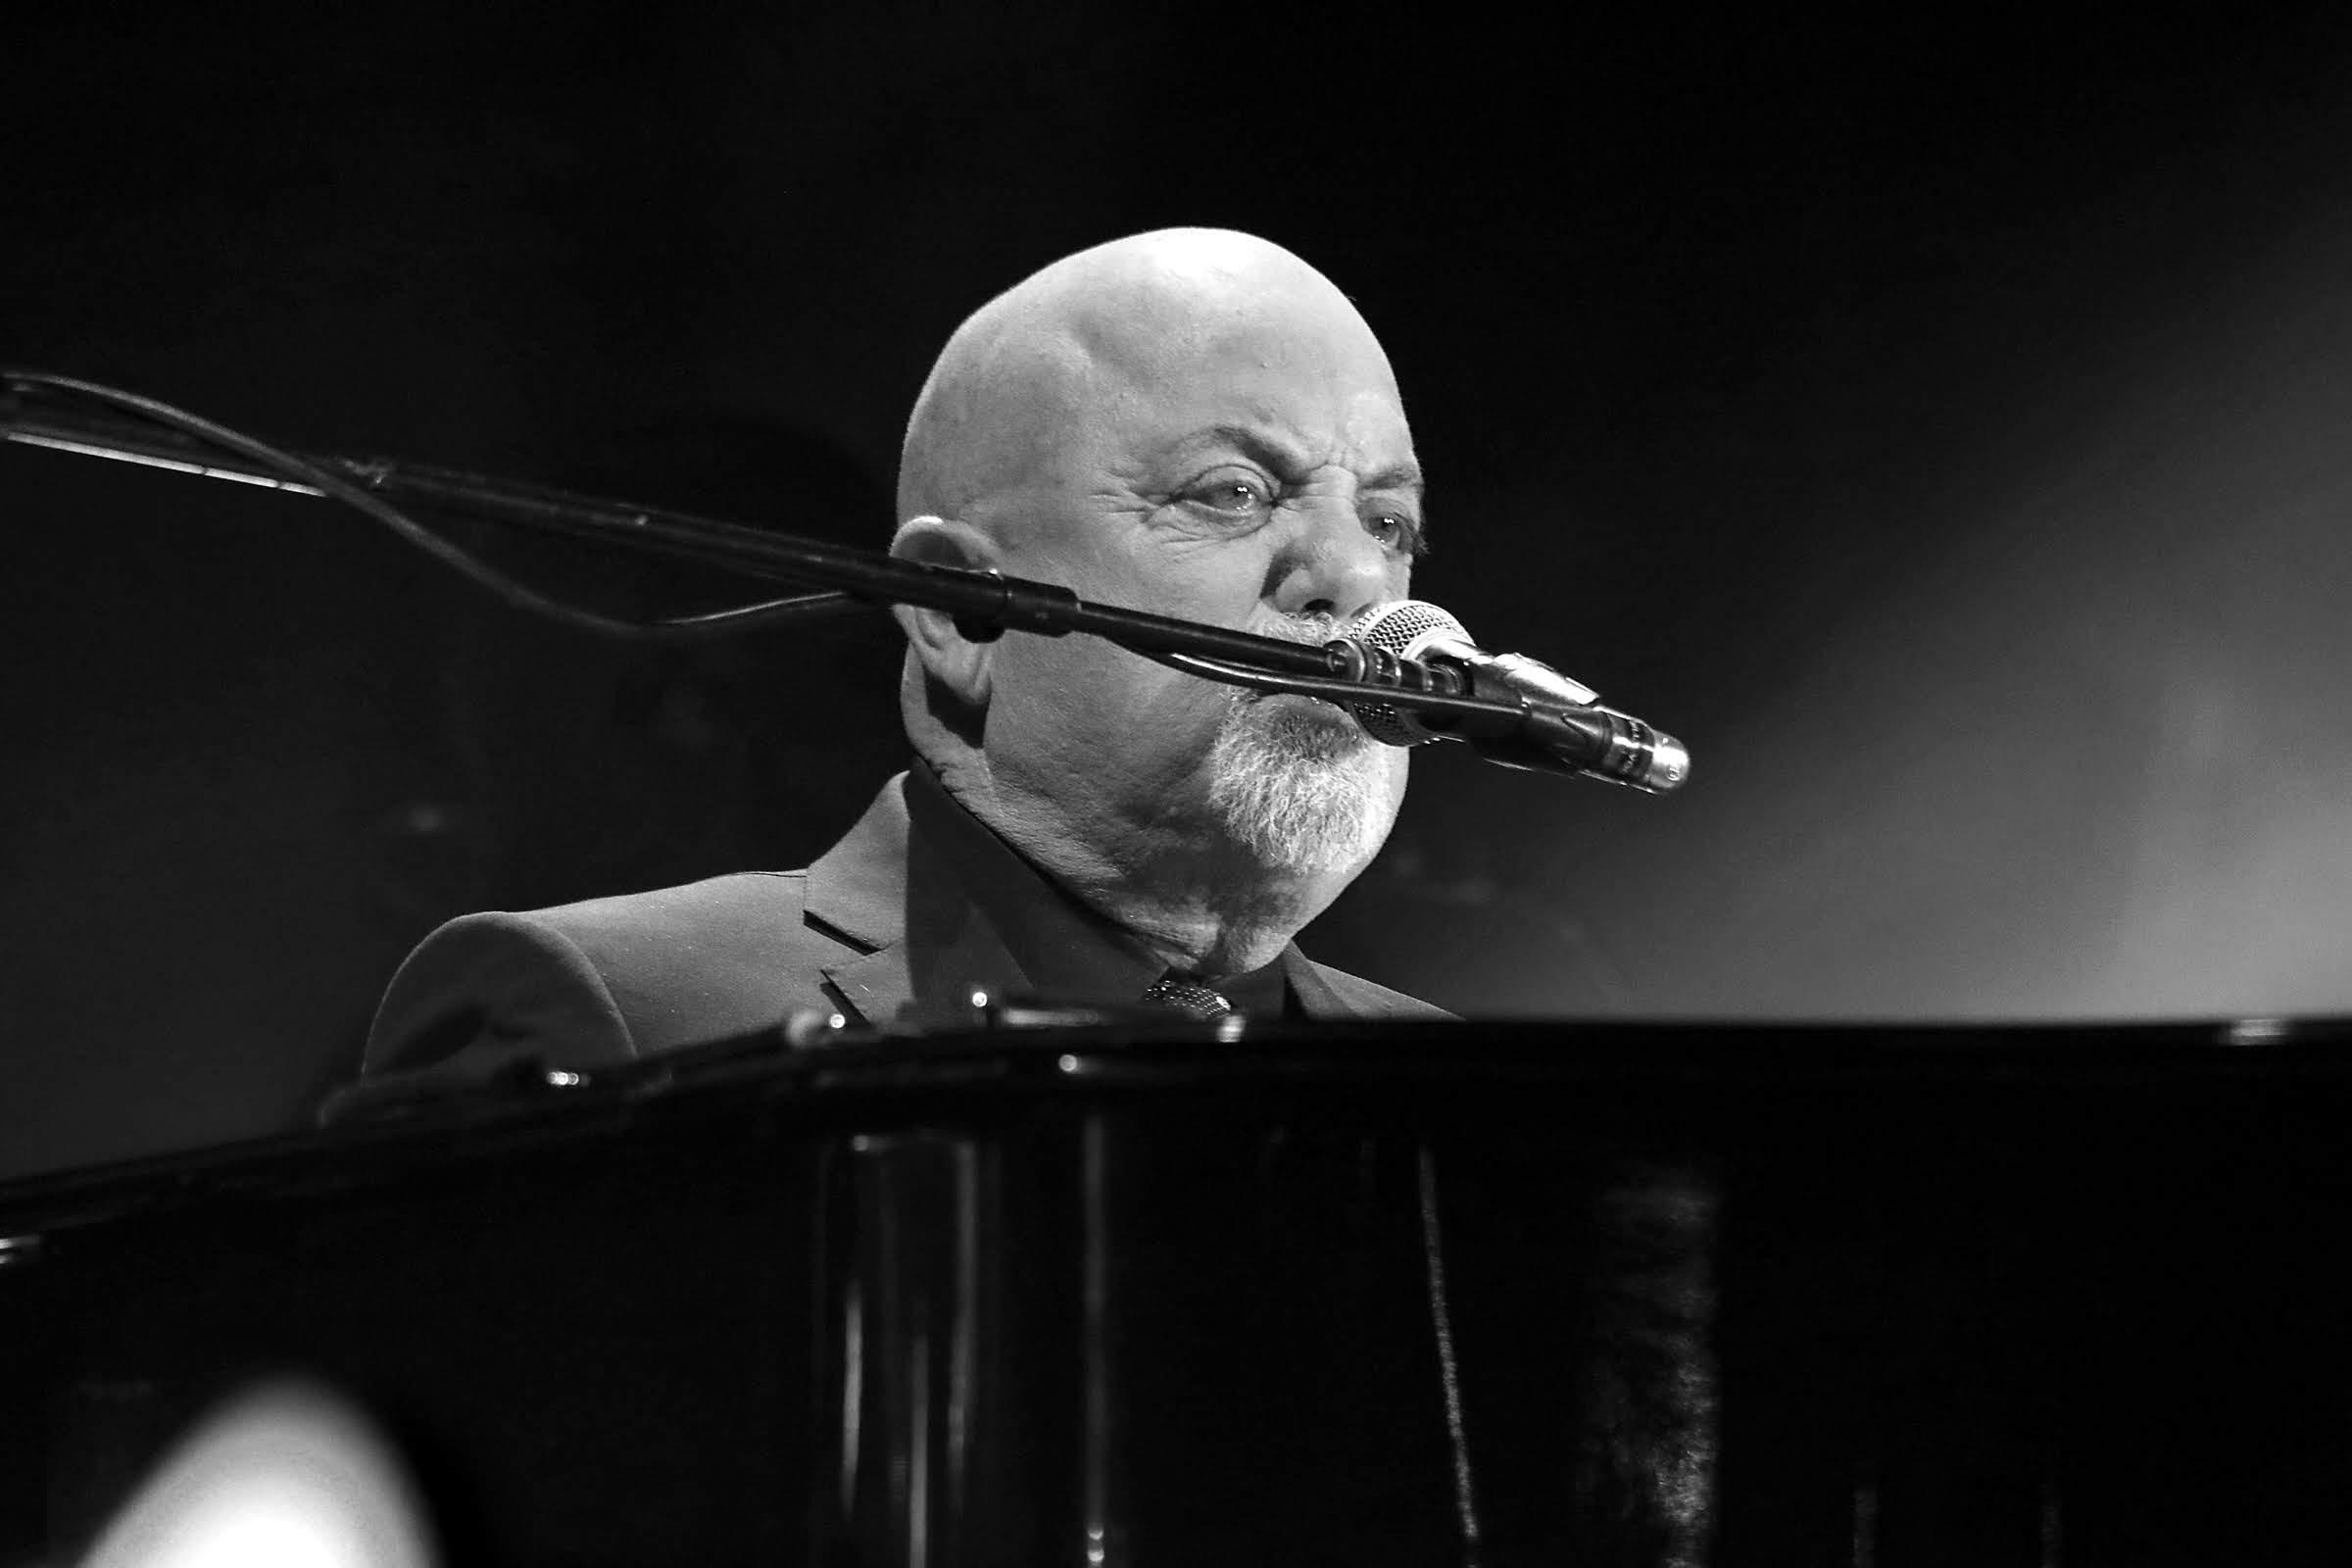 Billy Joel at Miller Park on Friday night April 26, 2019. Photo by Erol Reyal.